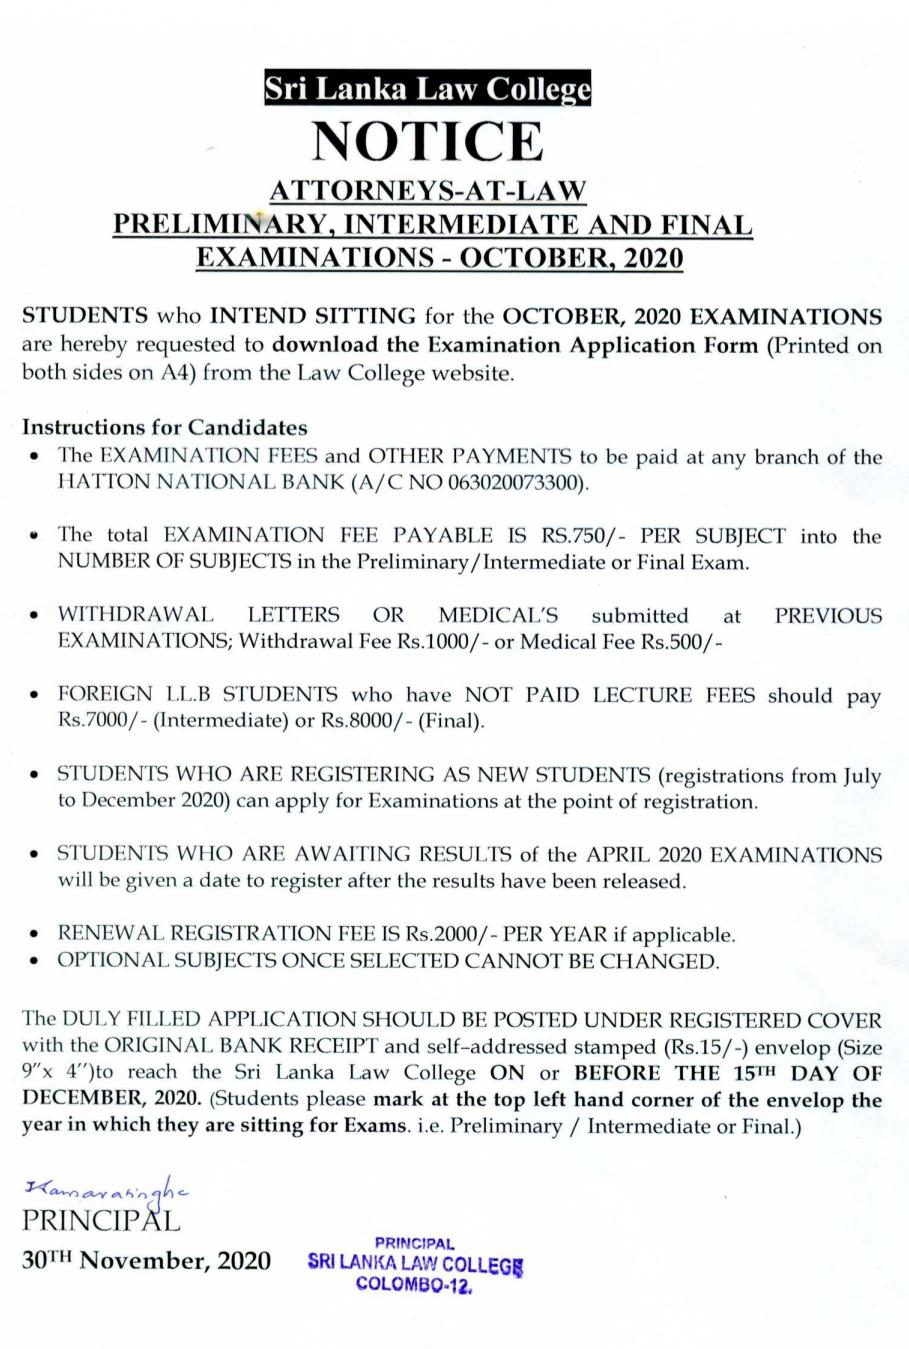 Sri Lanka Law College Exam Notice